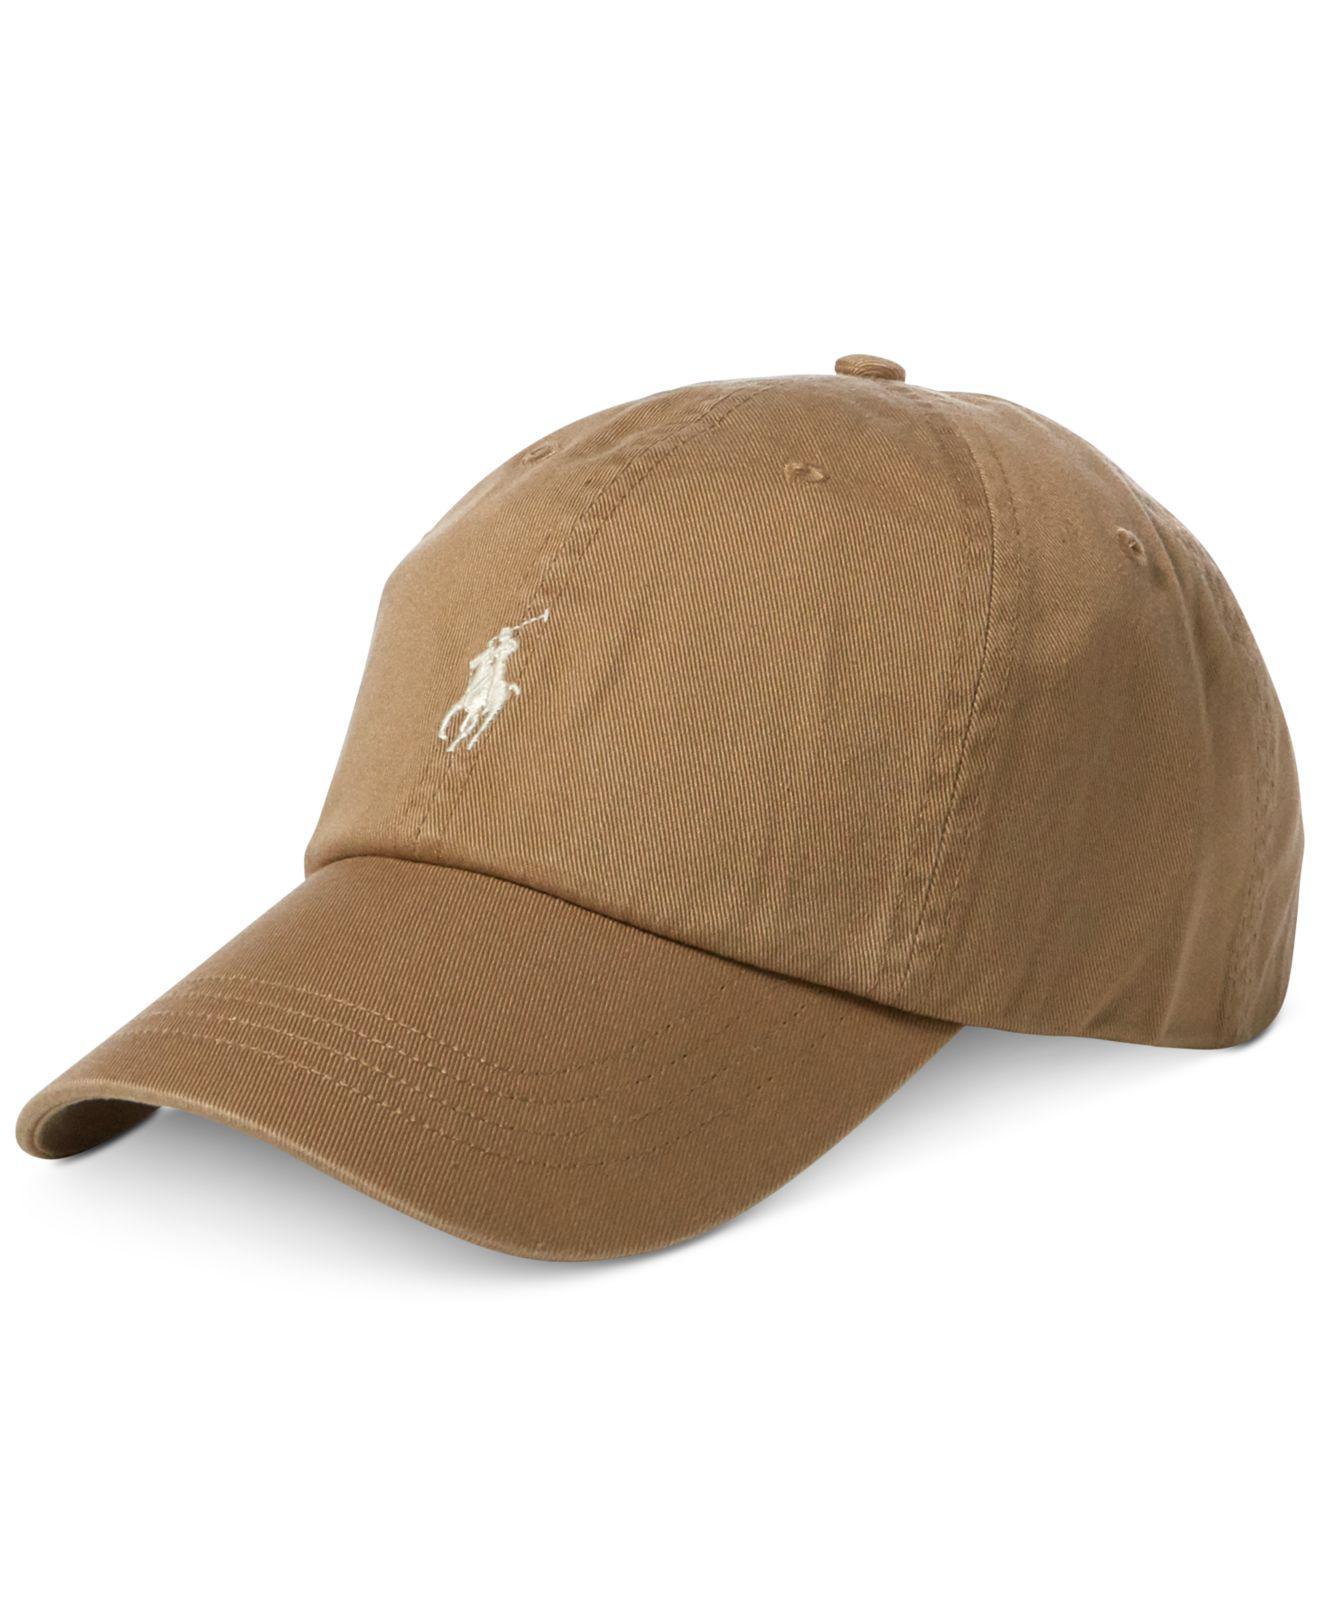 8843ee1c ... new zealand lyst polo ralph lauren chino baseball cap in brown for men  d32e0 12720